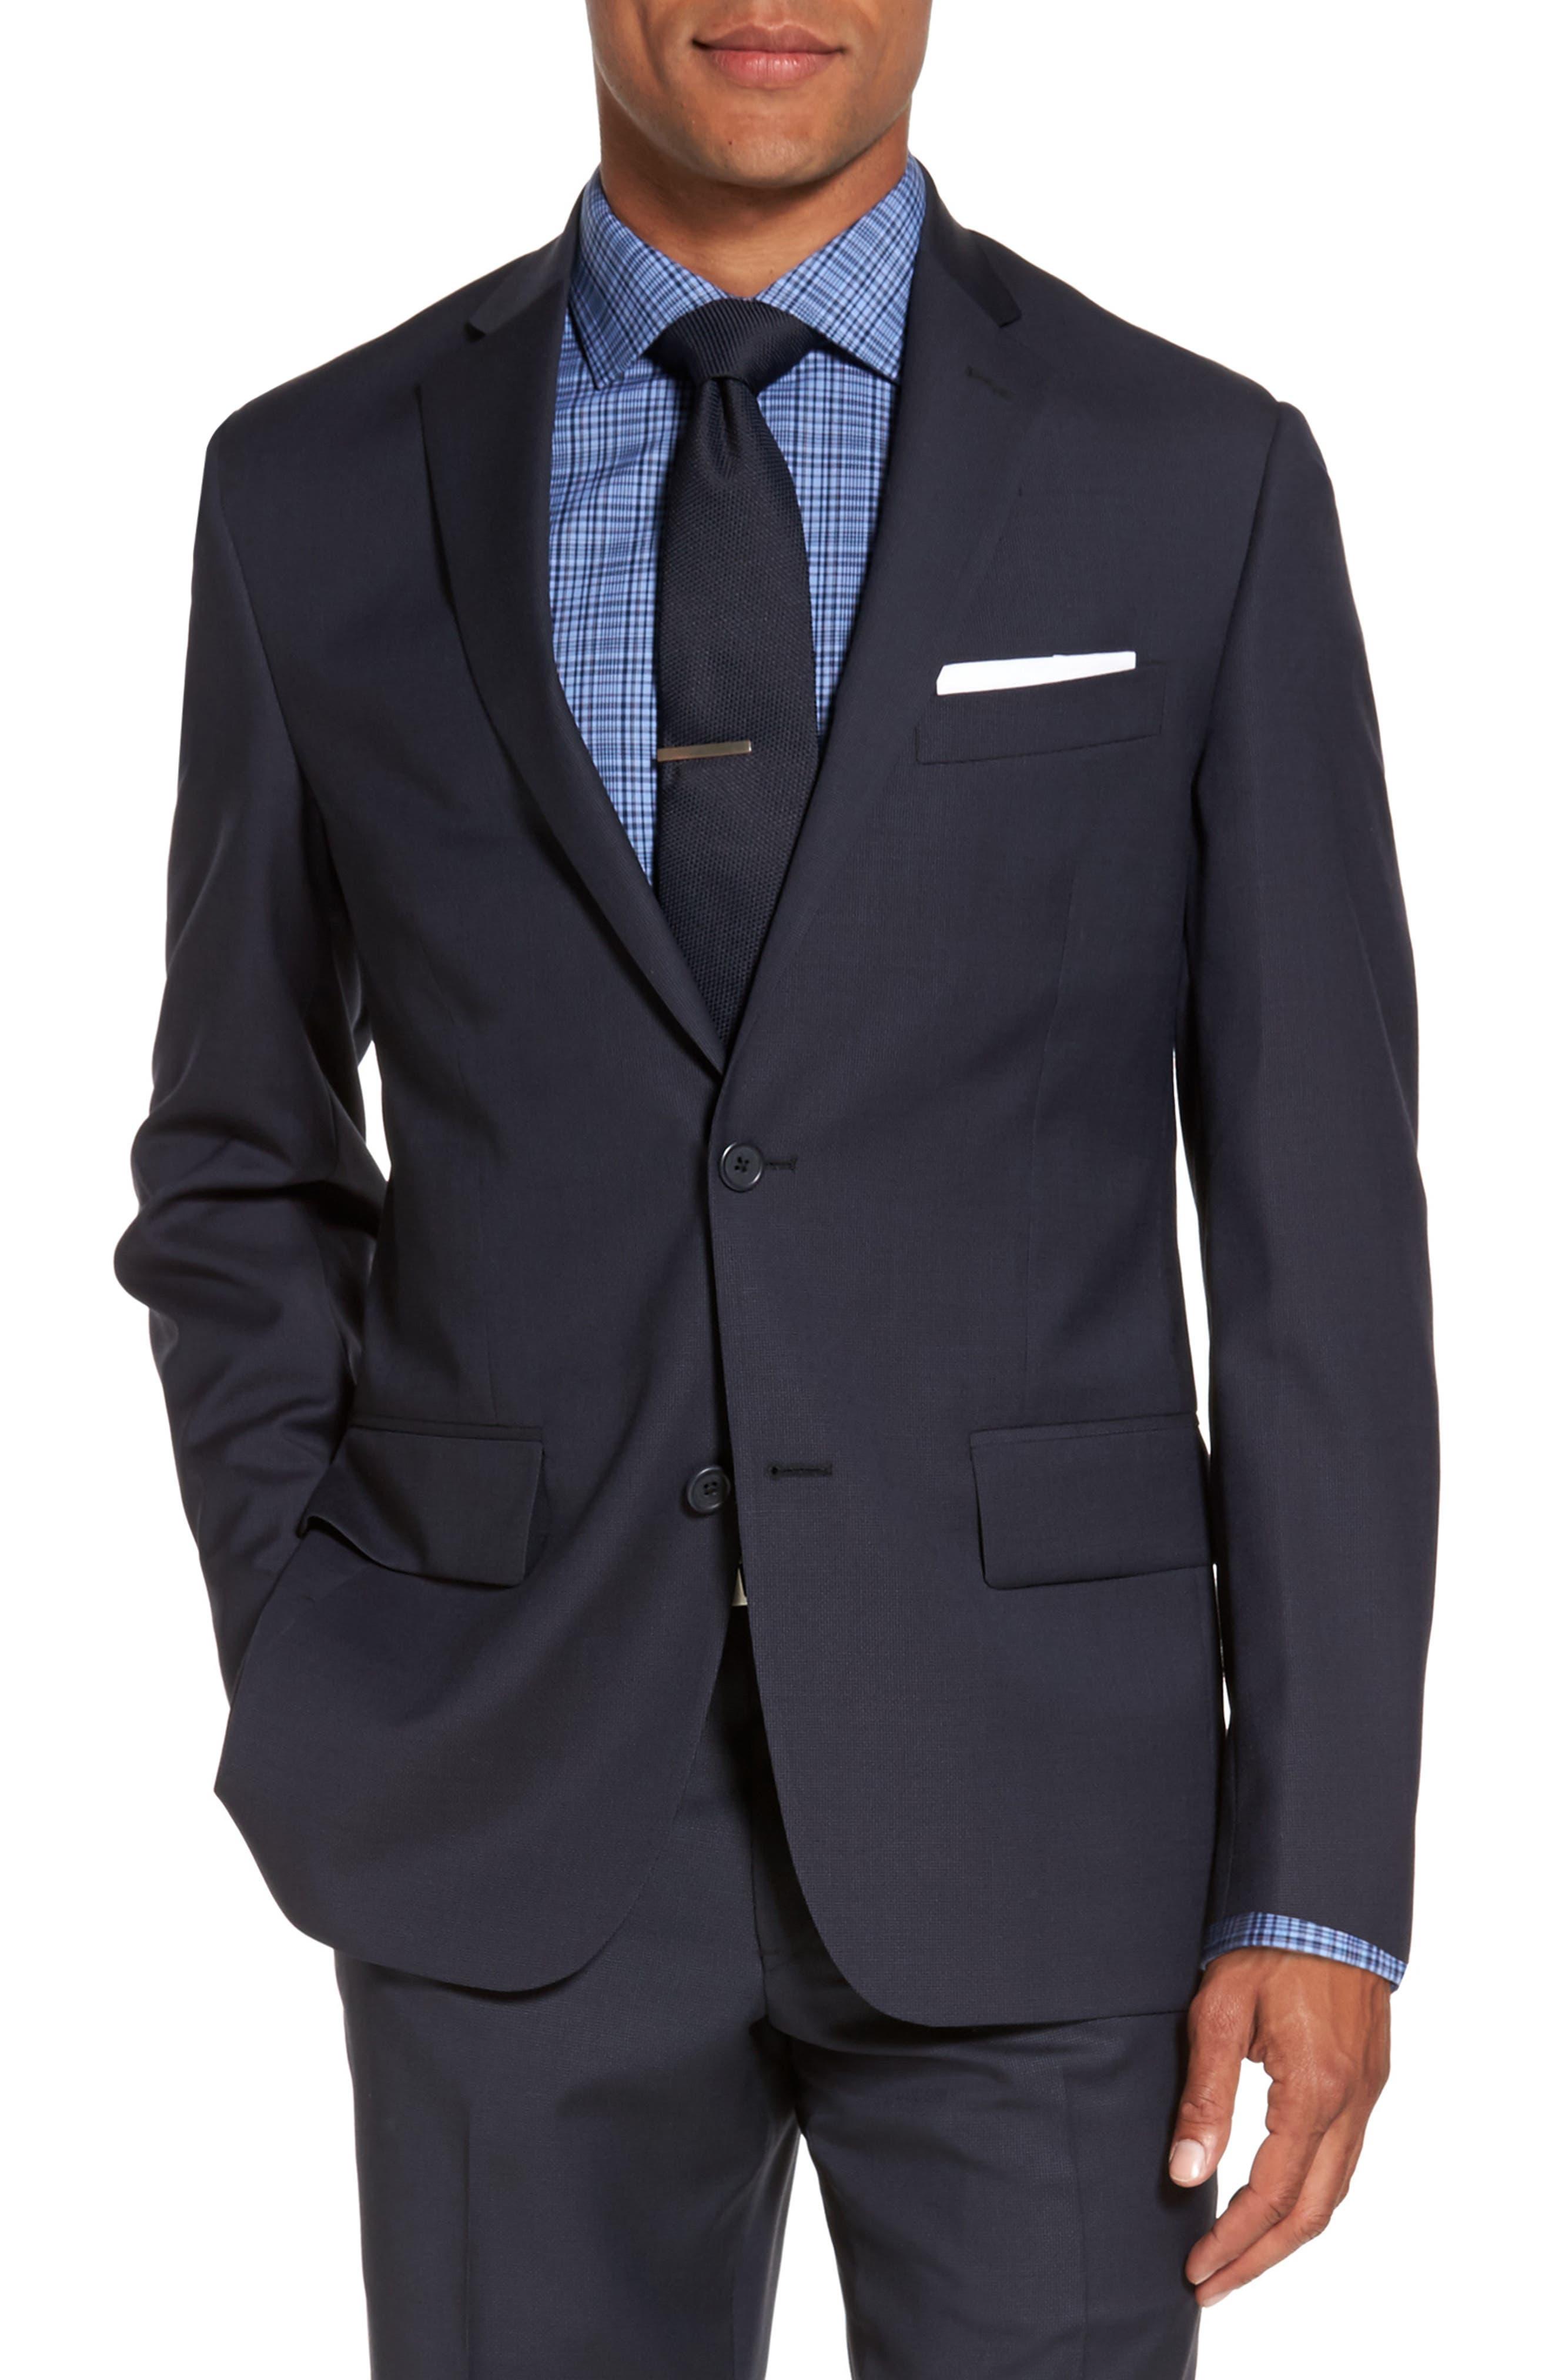 Alternate Image 1 Selected - Nordstrom Men's Shop Classic Fit Solid Wool Sport Coat